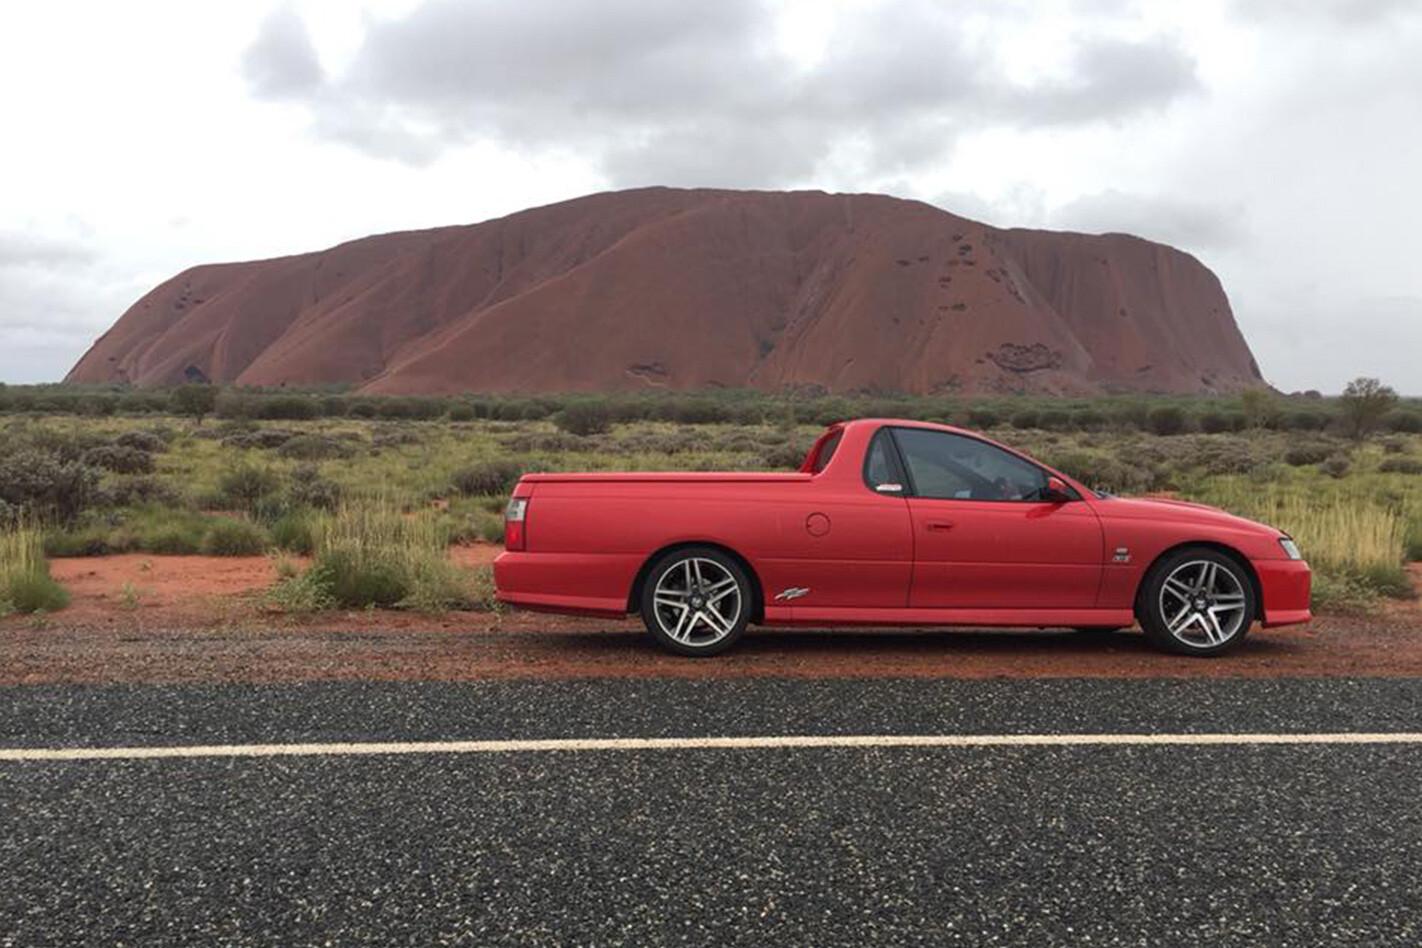 SS Ute Uluru 281 29 Jpg